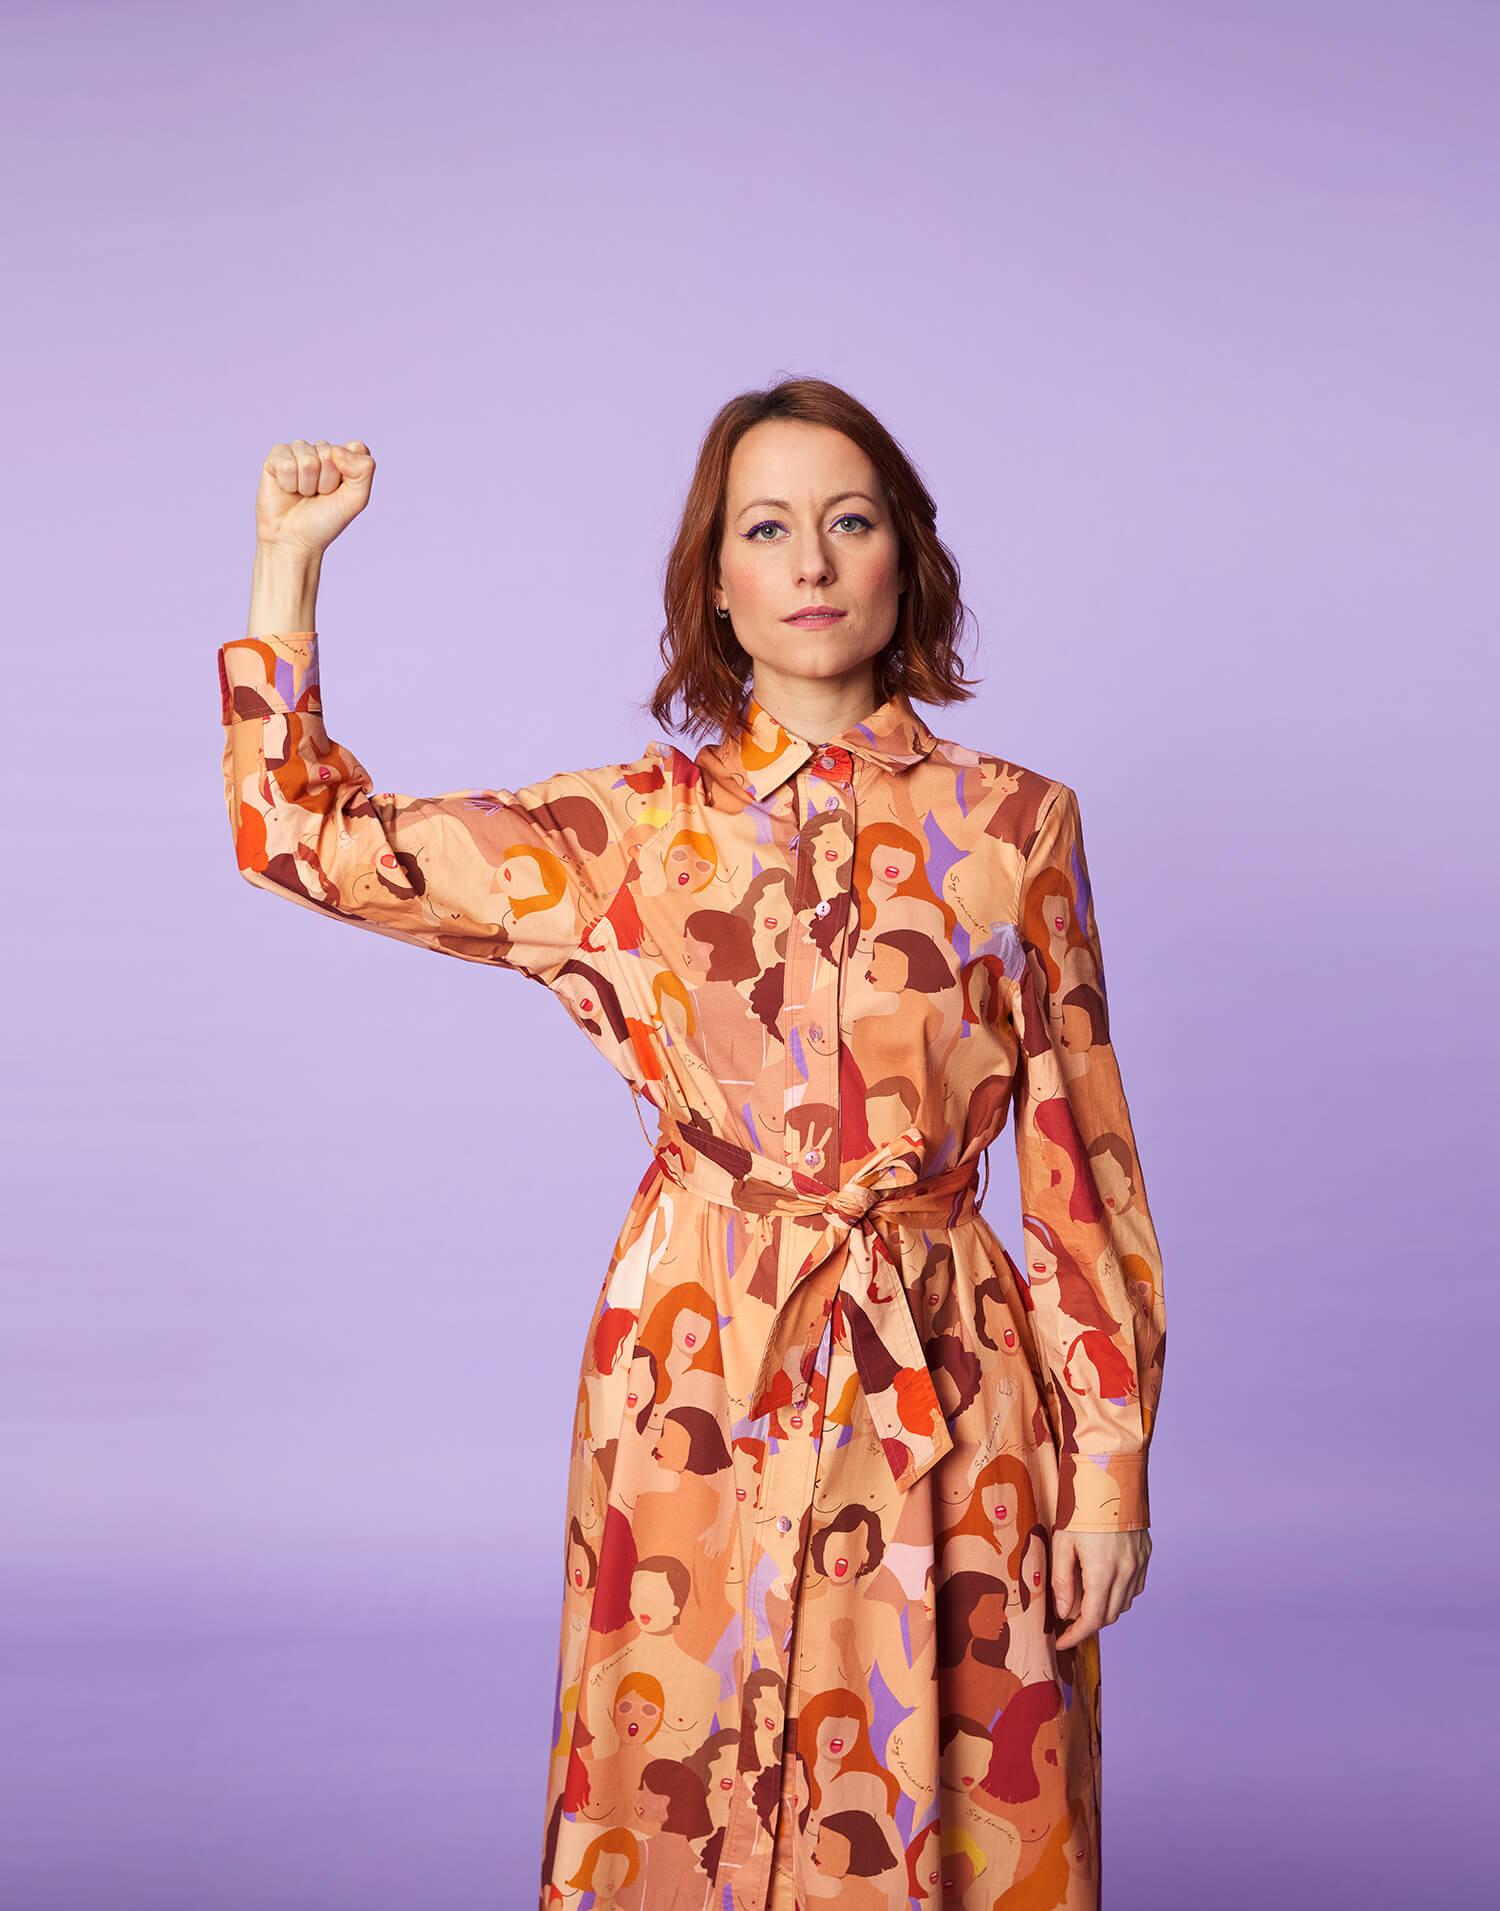 Vestido 'Soy Feminista' 2020